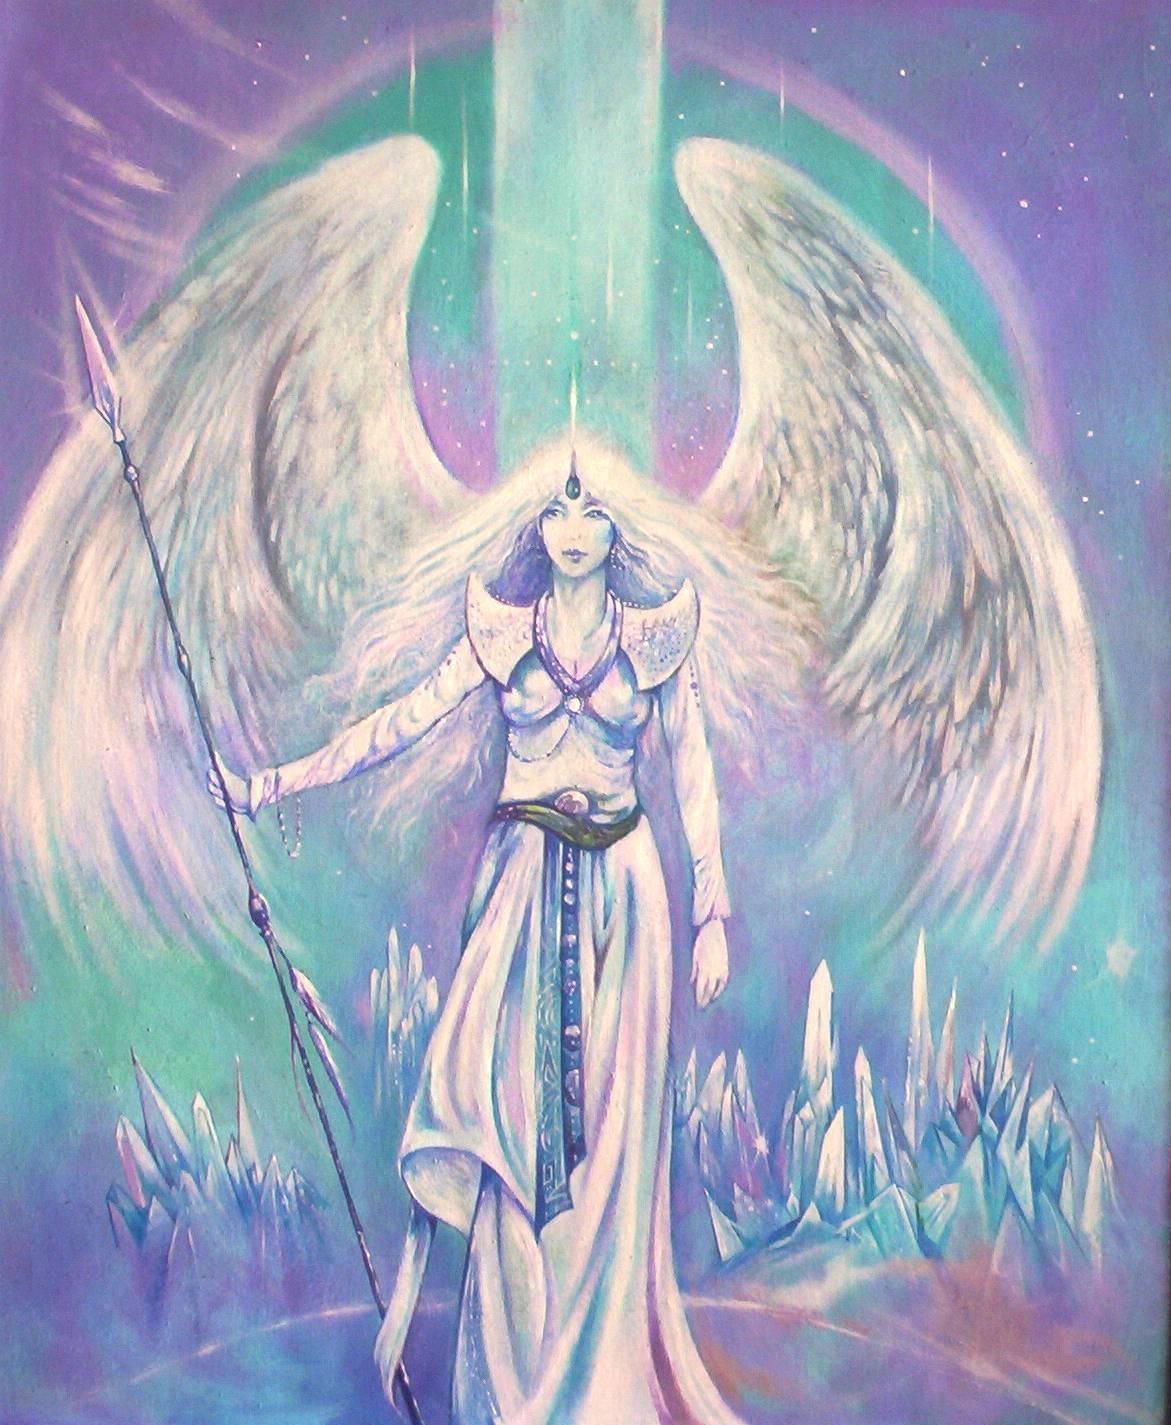 Angel of light by kaliban on deviantart